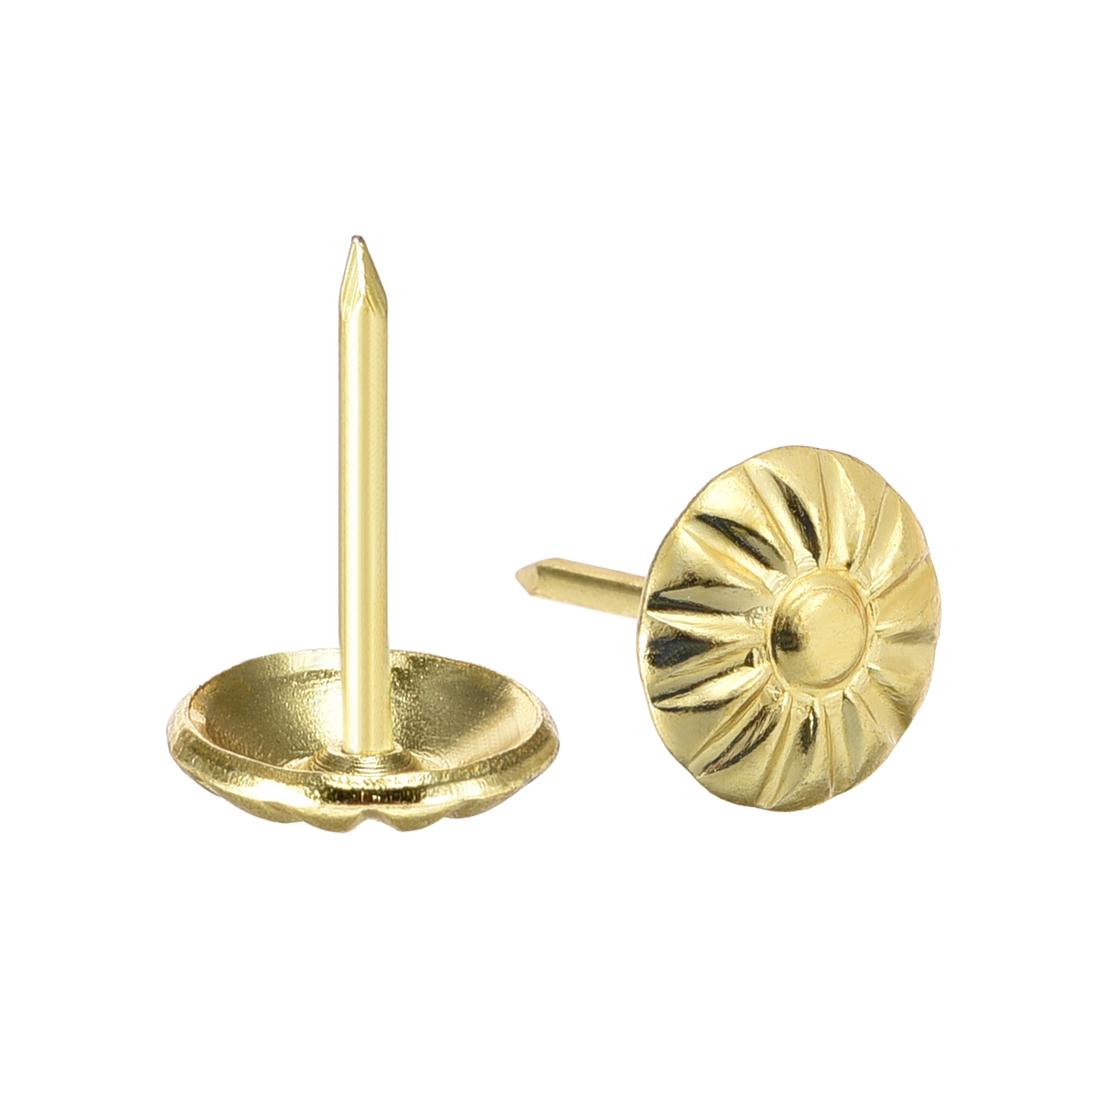 Upholstery Nails Tacks 11mm Dia 17mm Height Furniture Push Pins Gold Tone 100Pcs